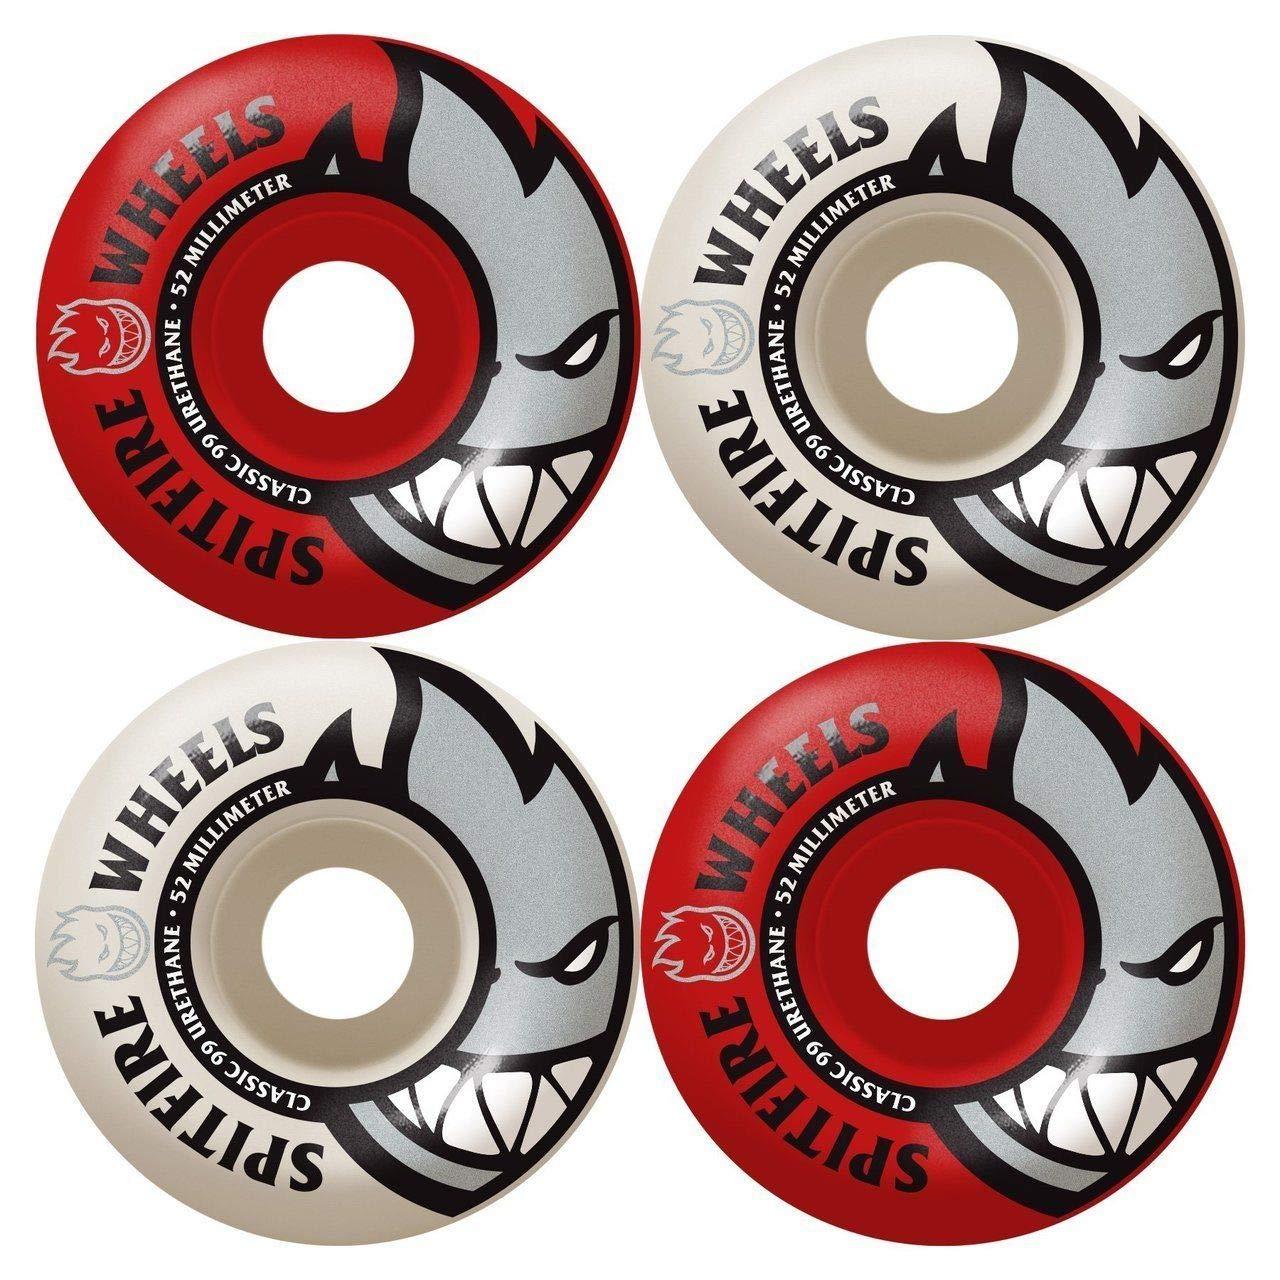 Classic 53Mm 99A White Red Skateboard Wheels